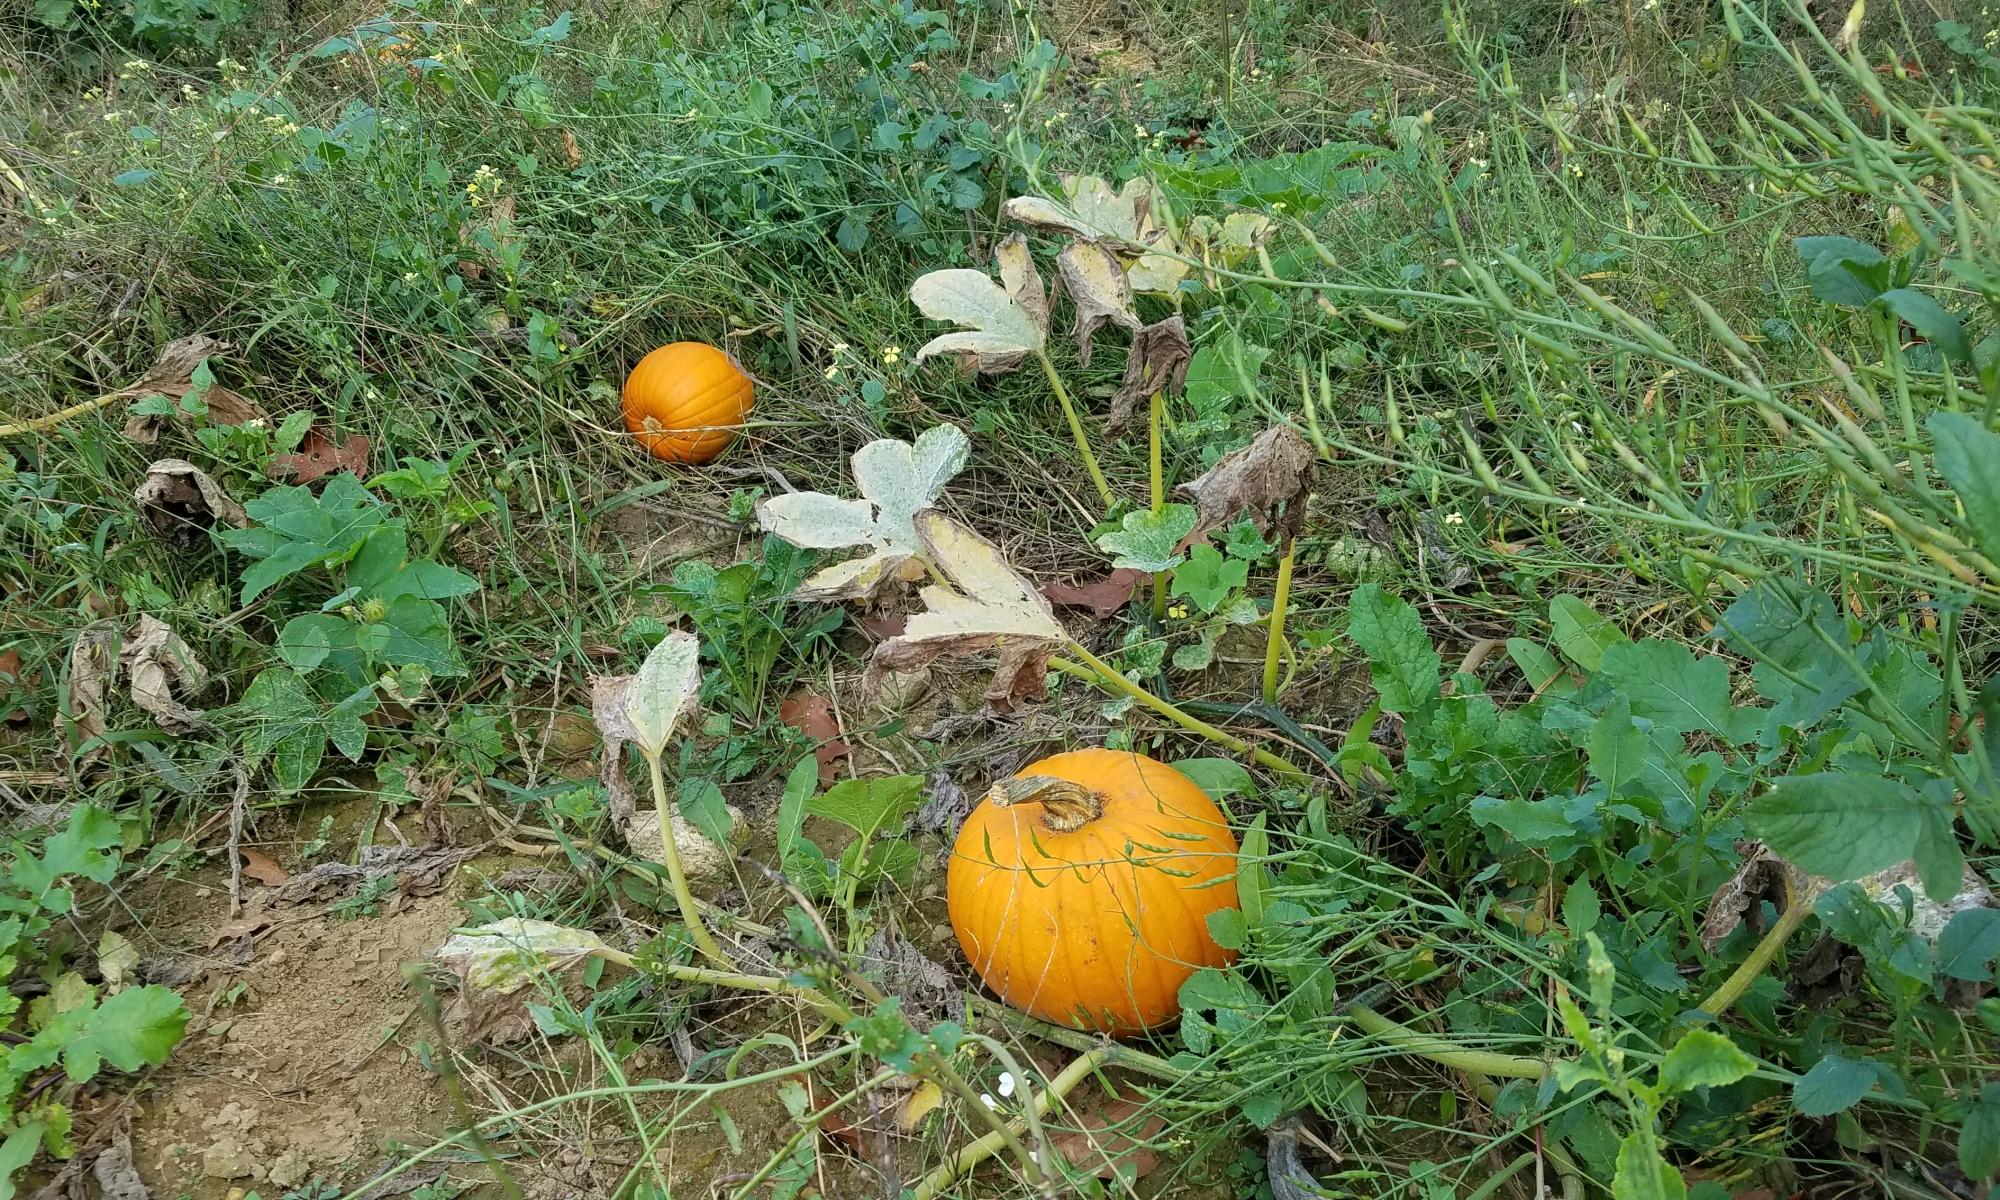 review-of-Pumpkin-Picking-at-Boston-Hill-Farm-North-Andover-MA